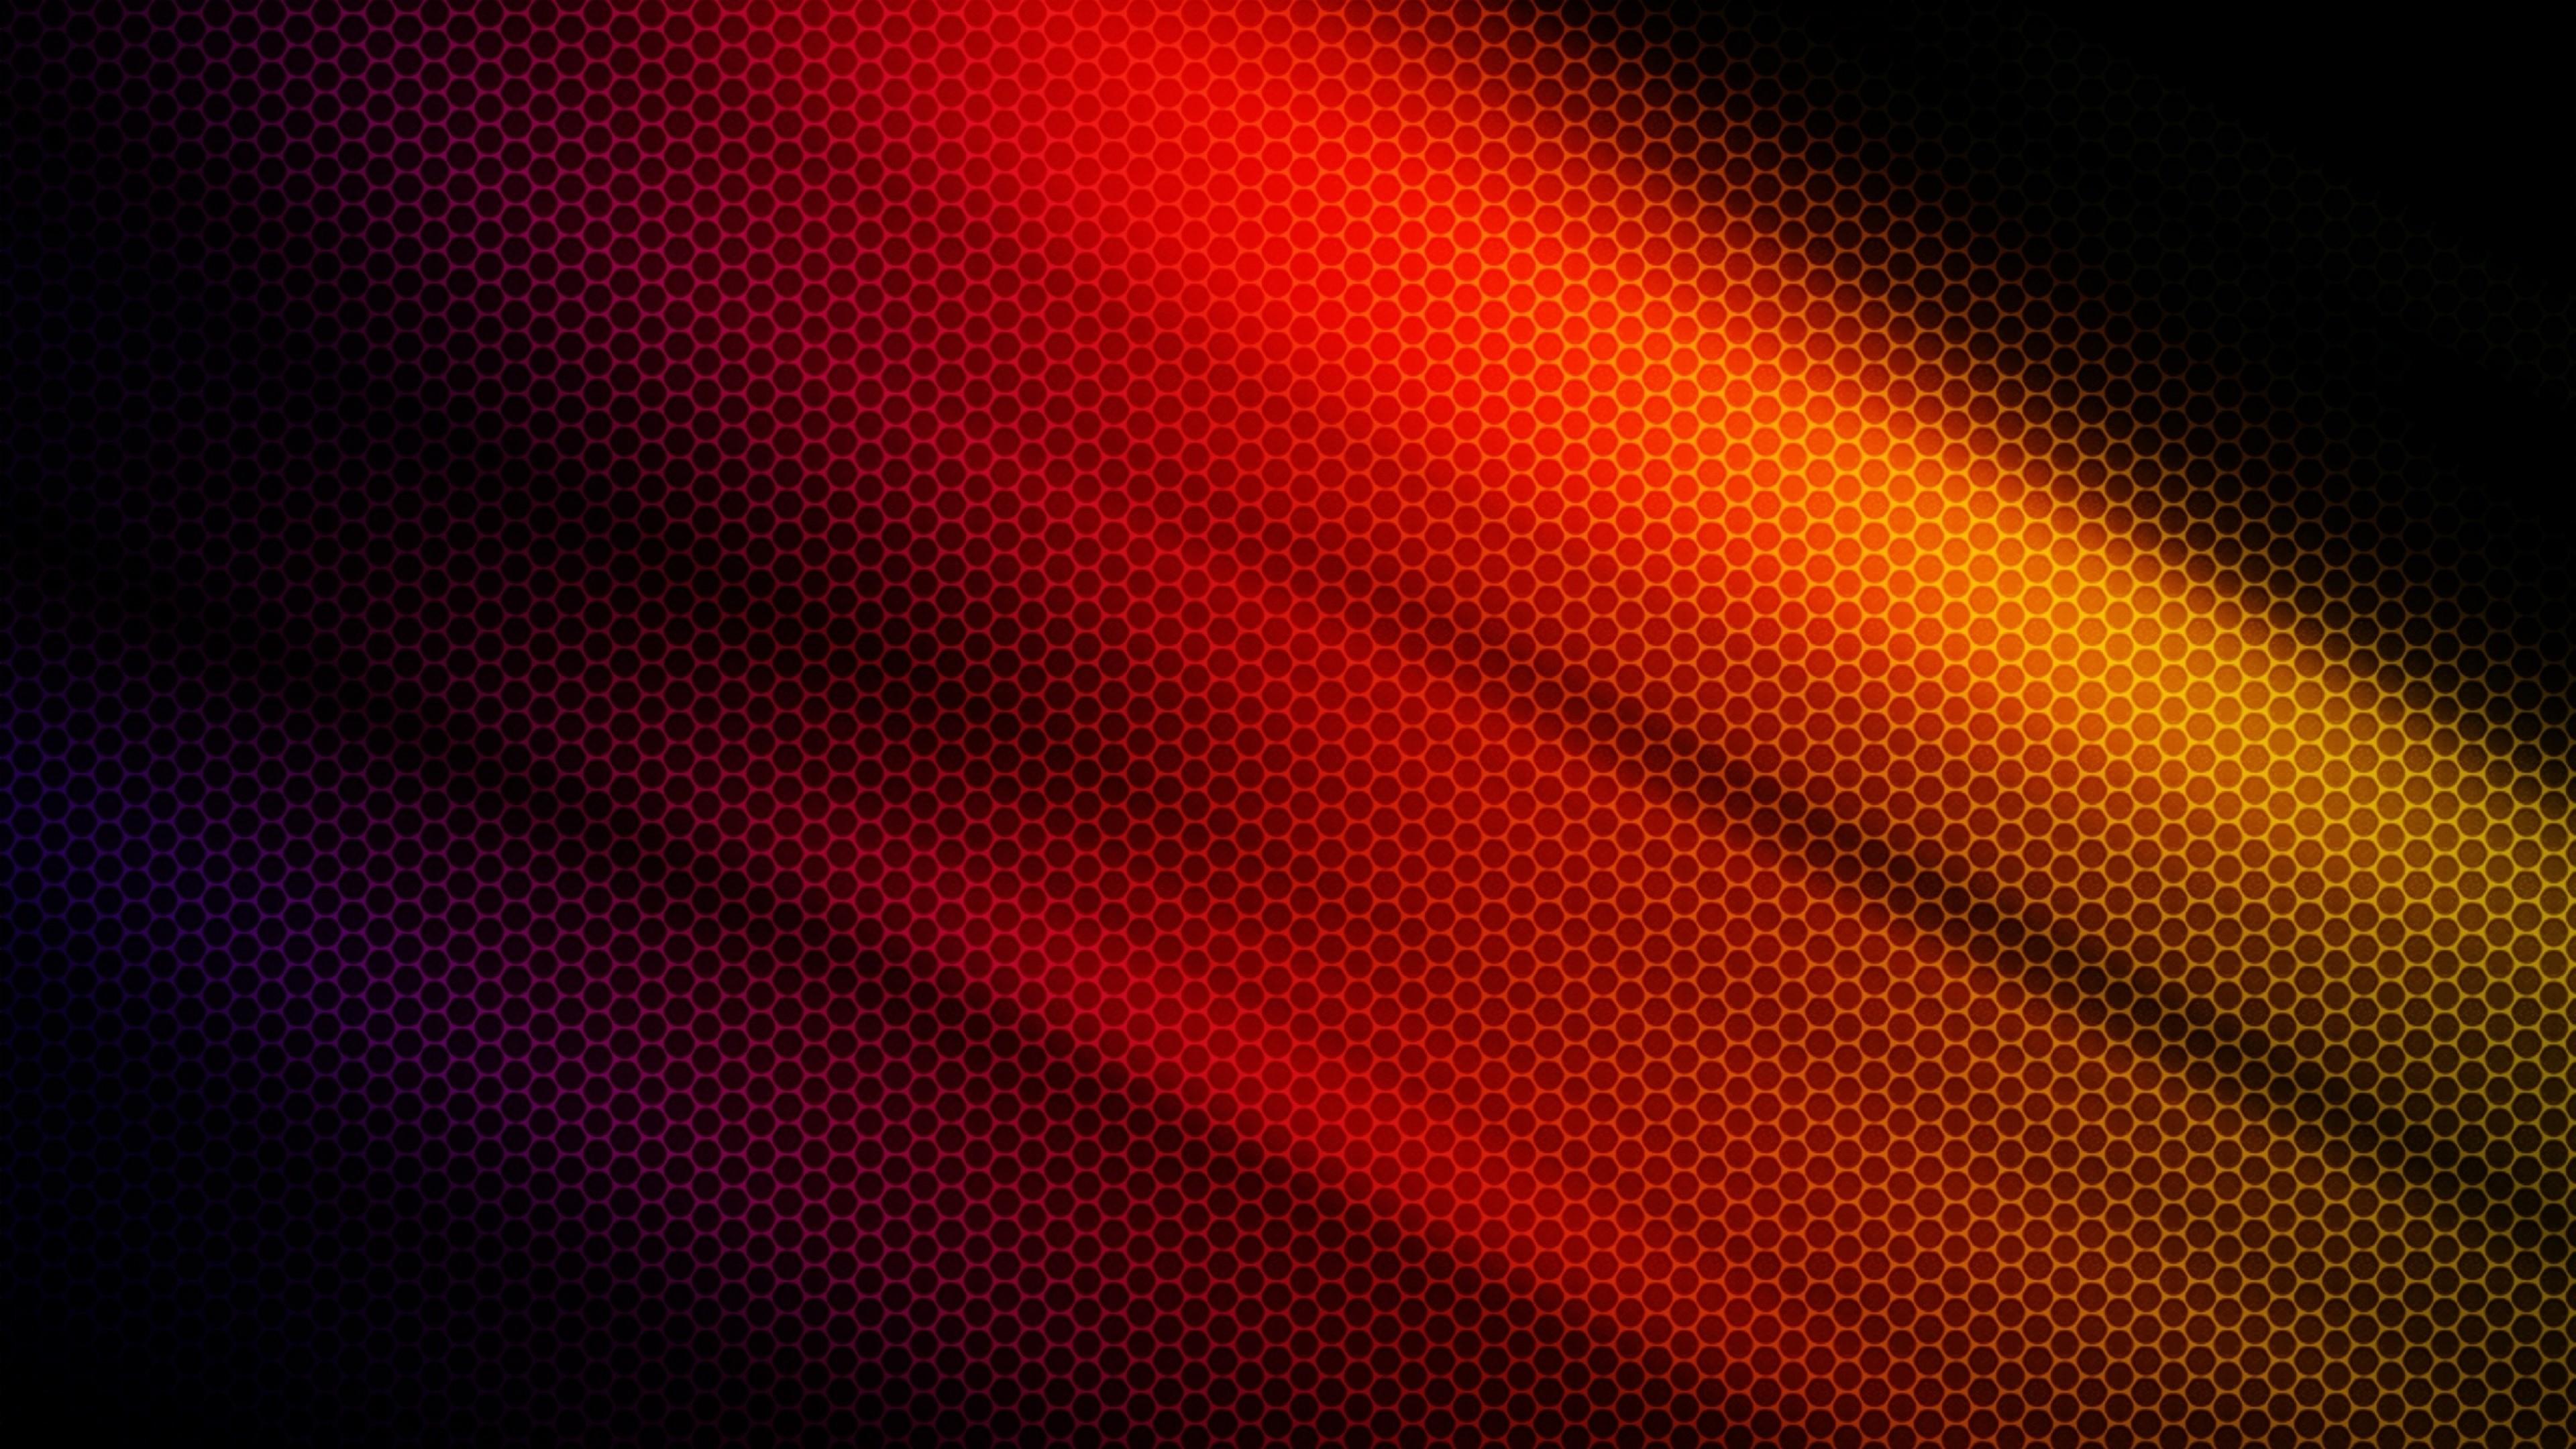 Wallpaper net, color, background, dark